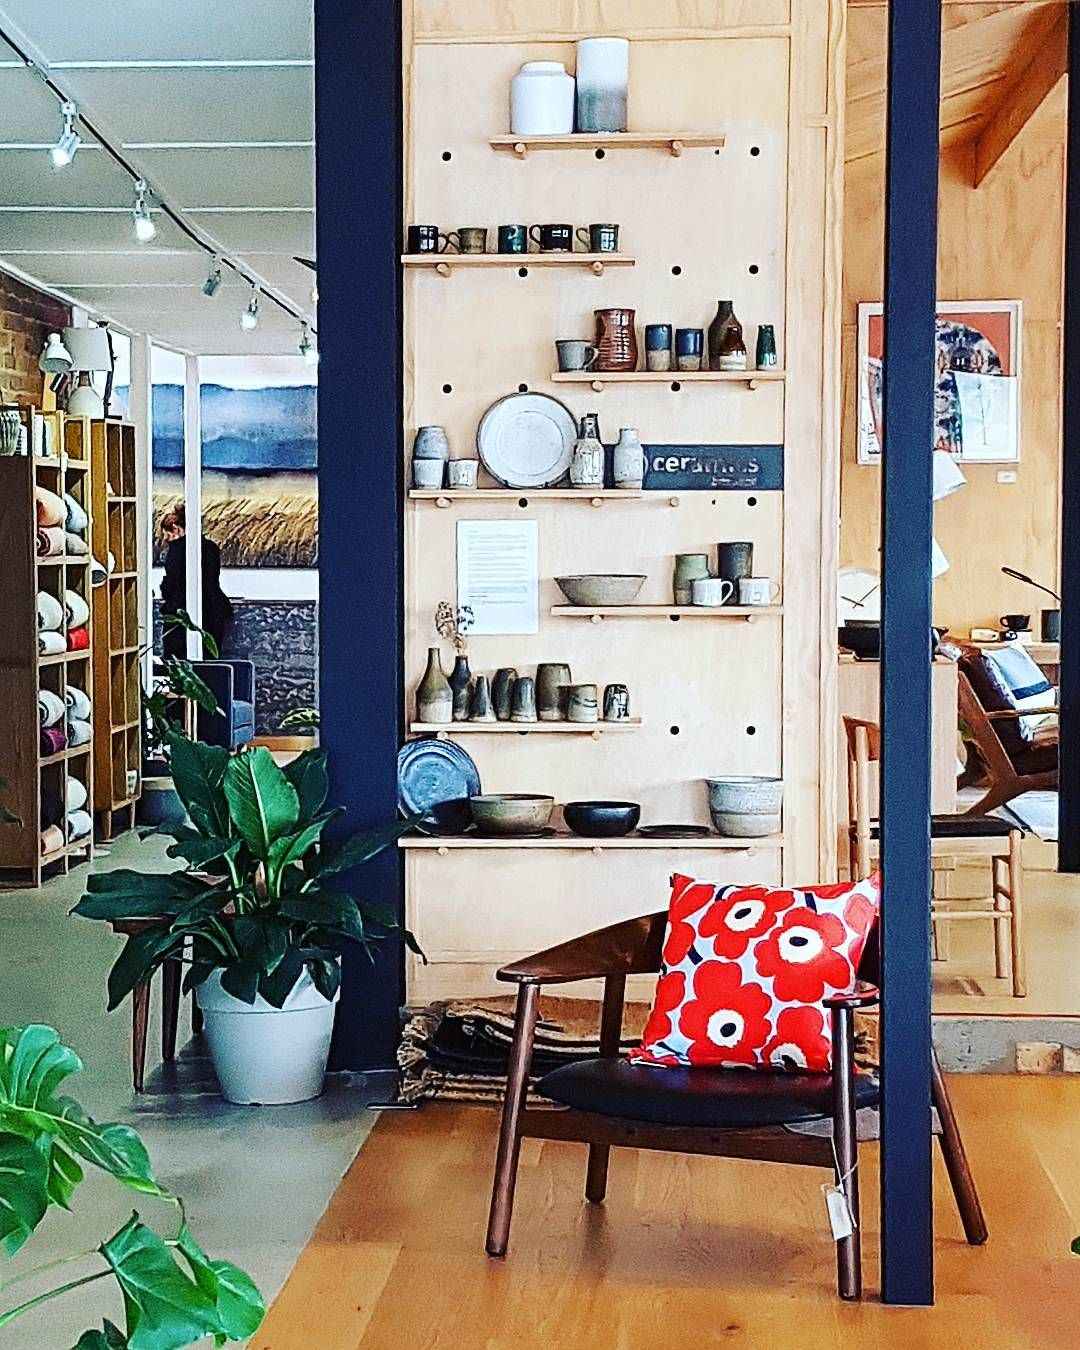 modern furniture store. Always A Happy Entry At The Modern Furniture Store🌾 @marimekkoaustralia #scandinavian #danishfurniture Store